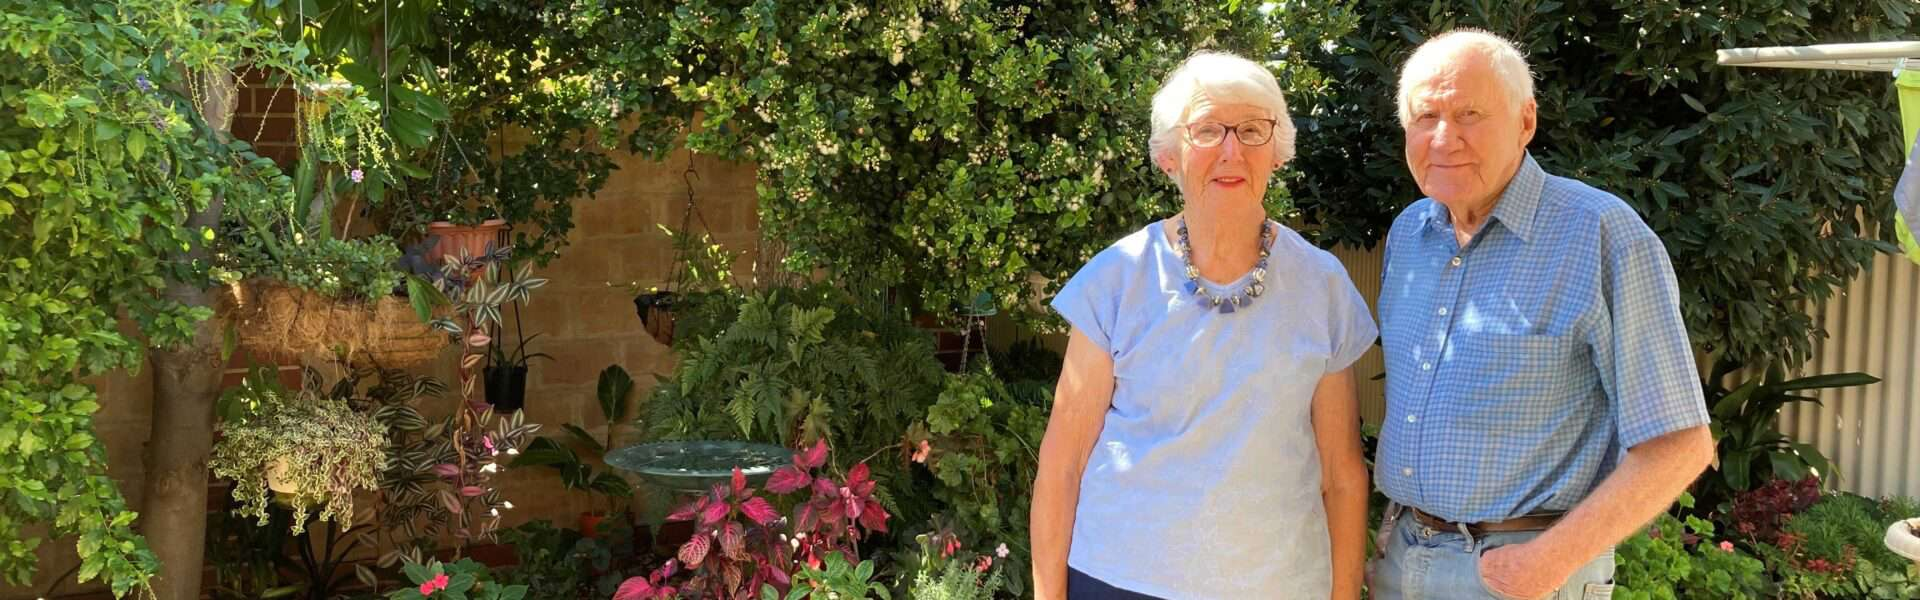 60th Wedding Anniversary at Karidis Retirement Villages